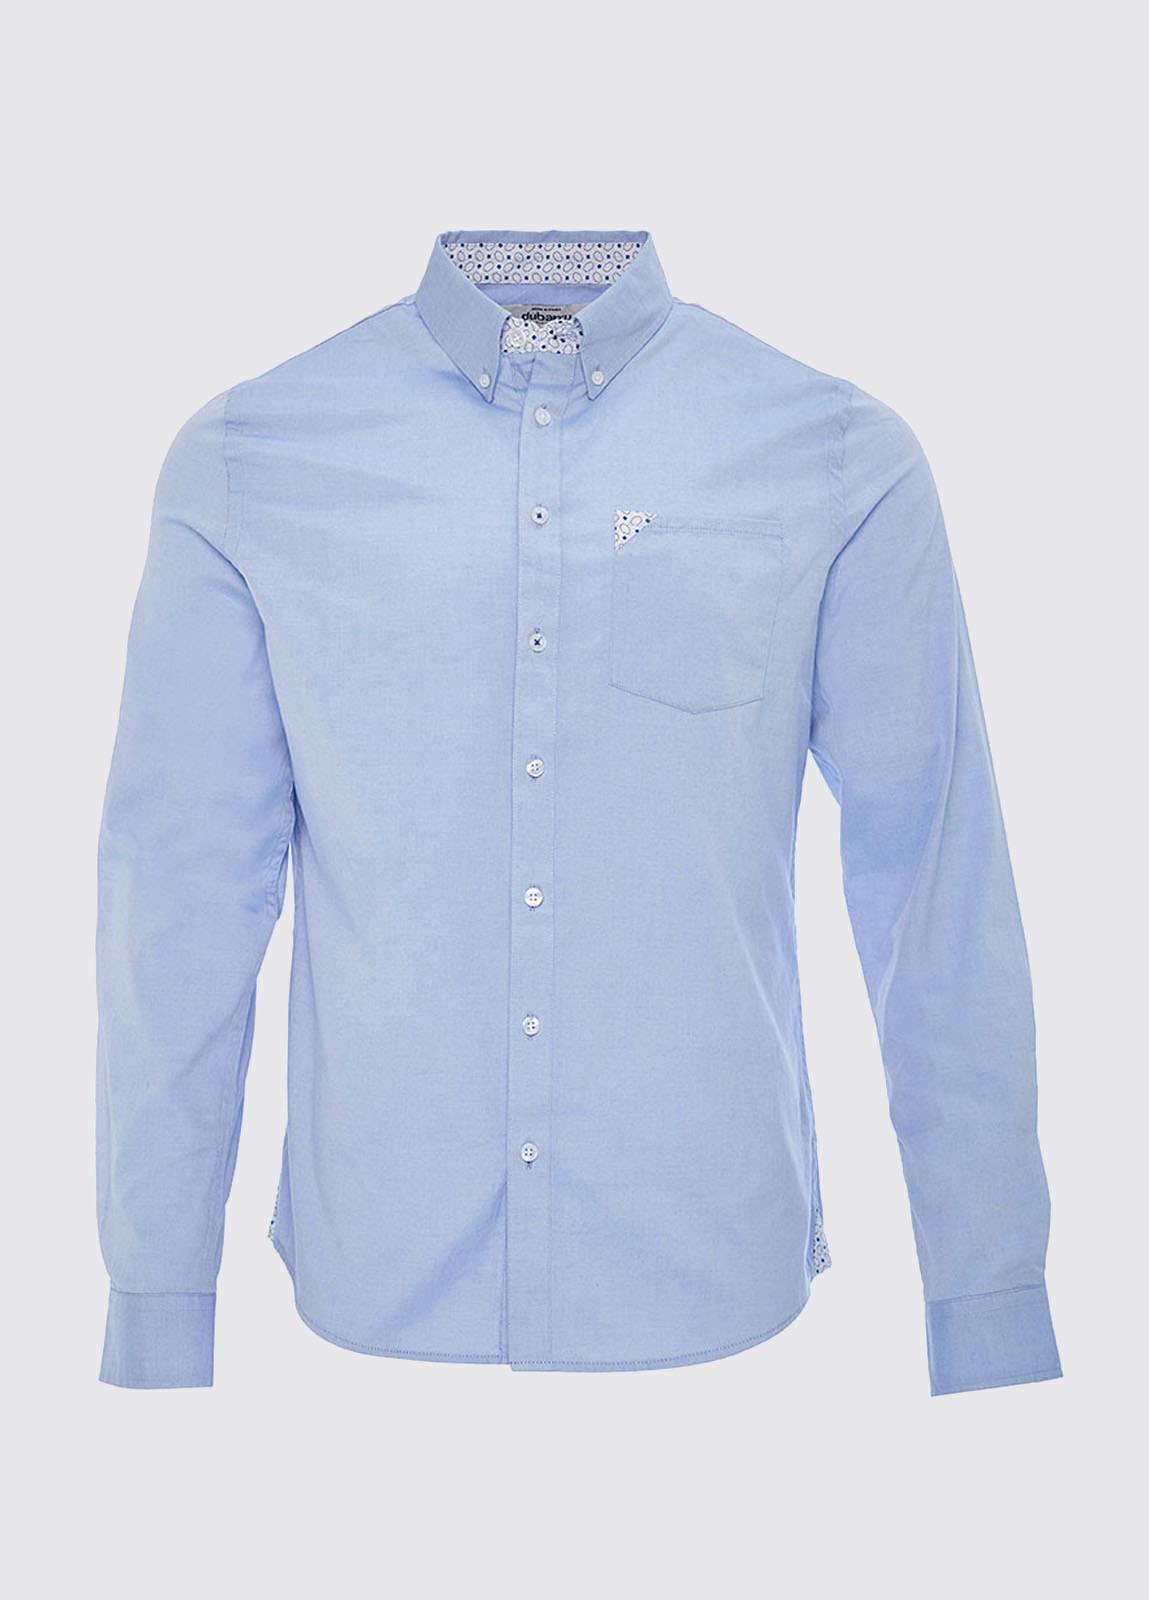 Rathdrum Pinpoint Oxford Shirt - Blue